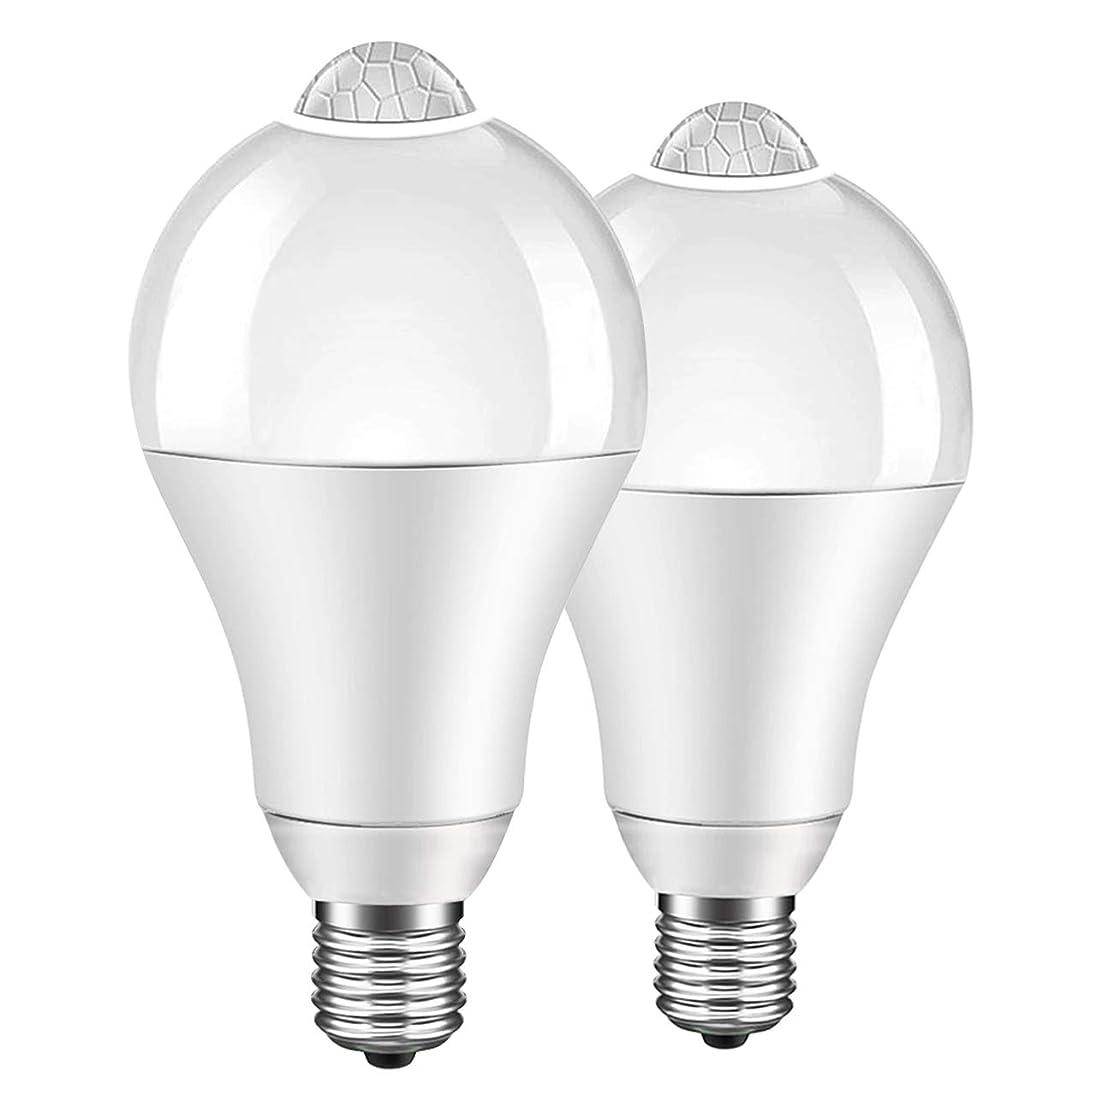 E17 Motion Activated Bulbs 5W Motion Sensor LED Light Bulb, for Front Door Garage Basement Hallway Stairs, 3000K Warm White (2 Pack)